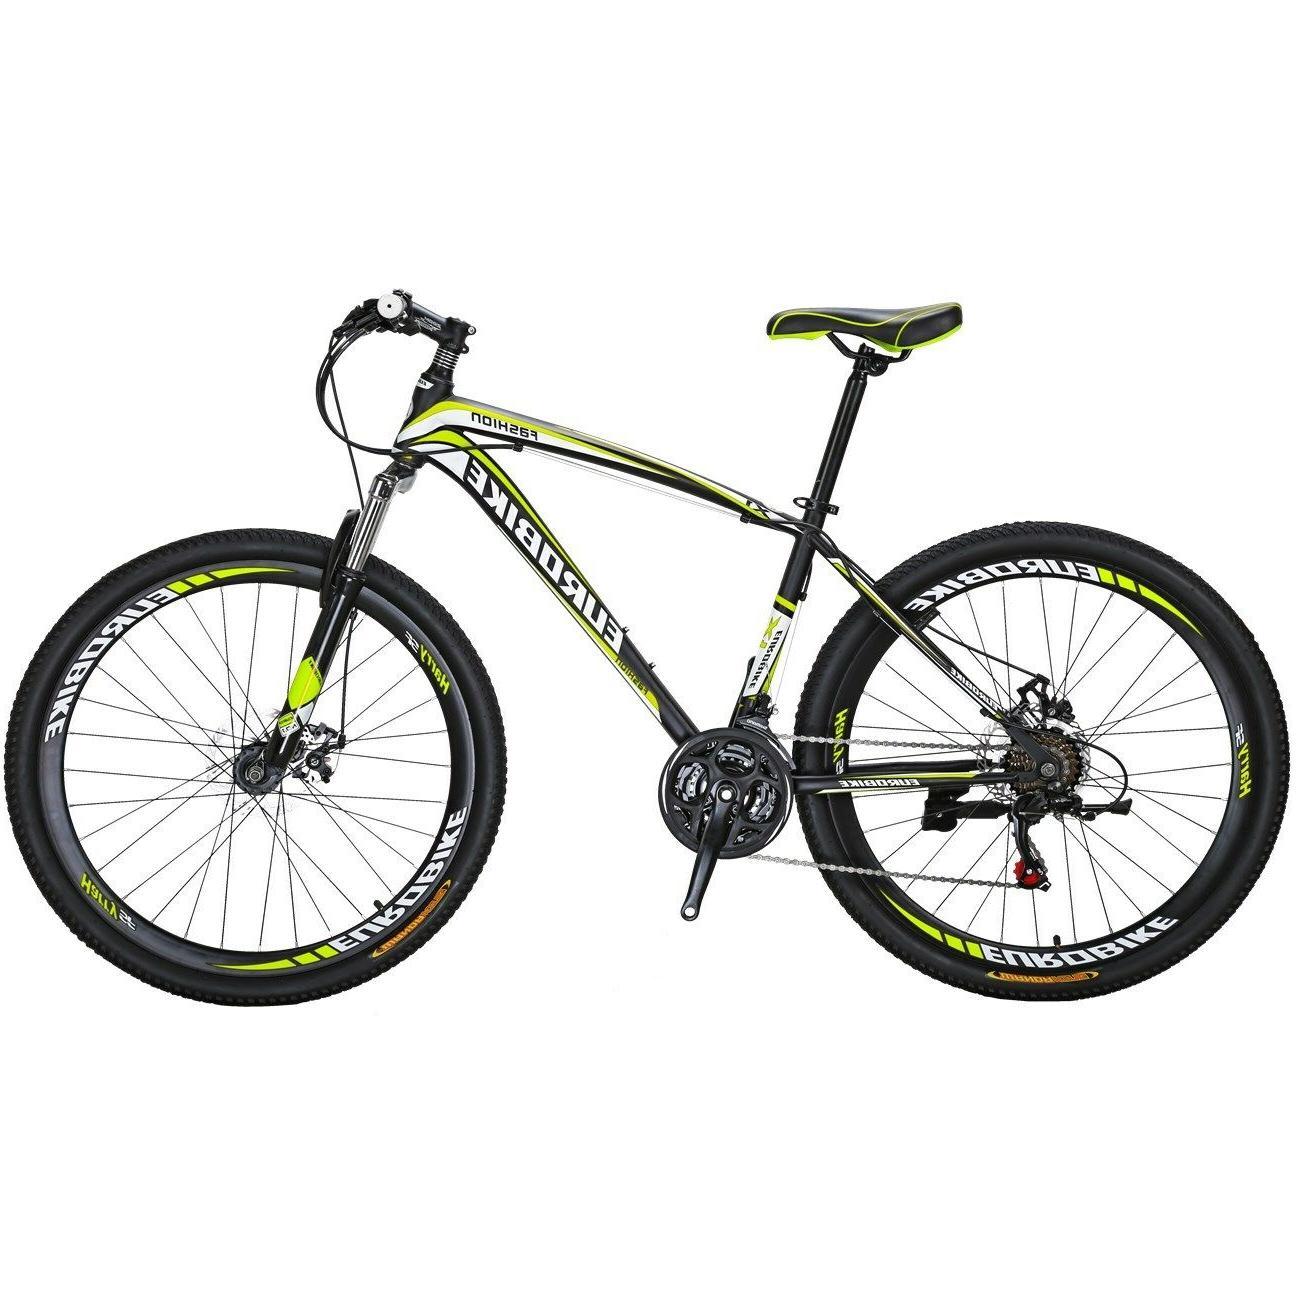 "Mountain Shimano 21 Mens Bikes MTB 27.5"" bicycle L"